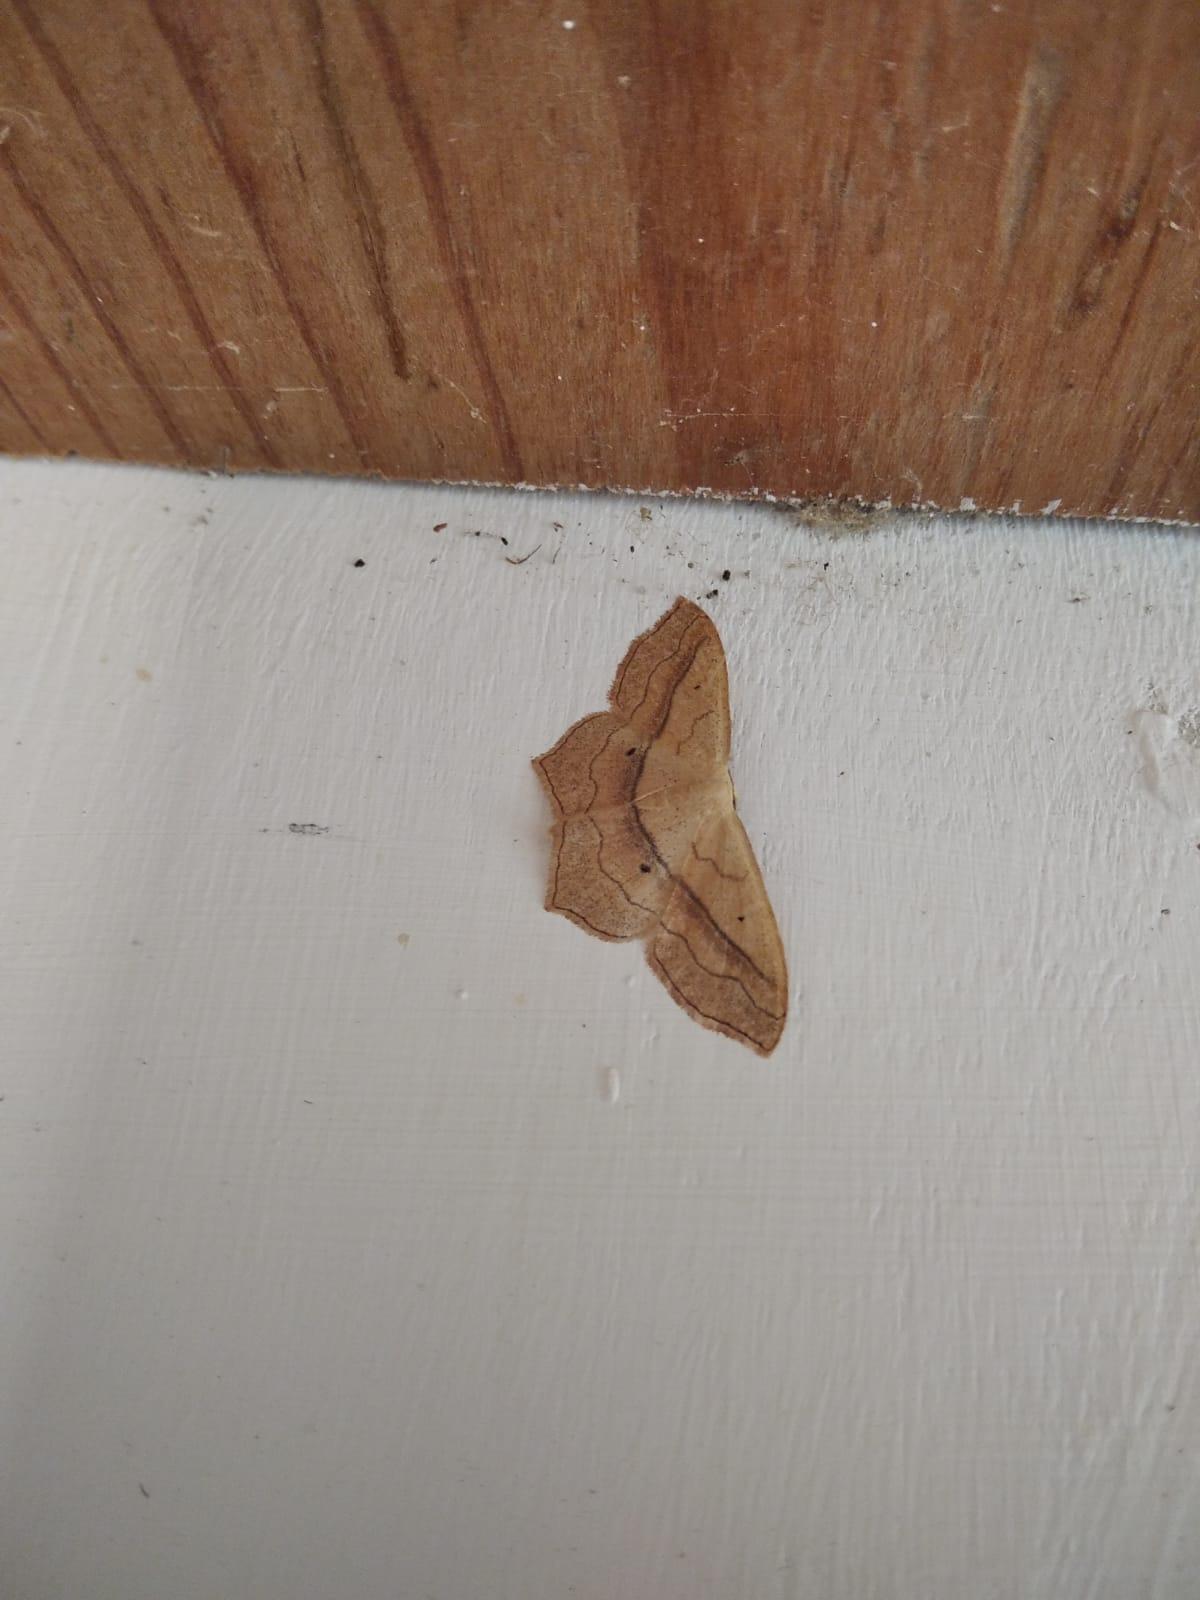 Daily Moth Exam